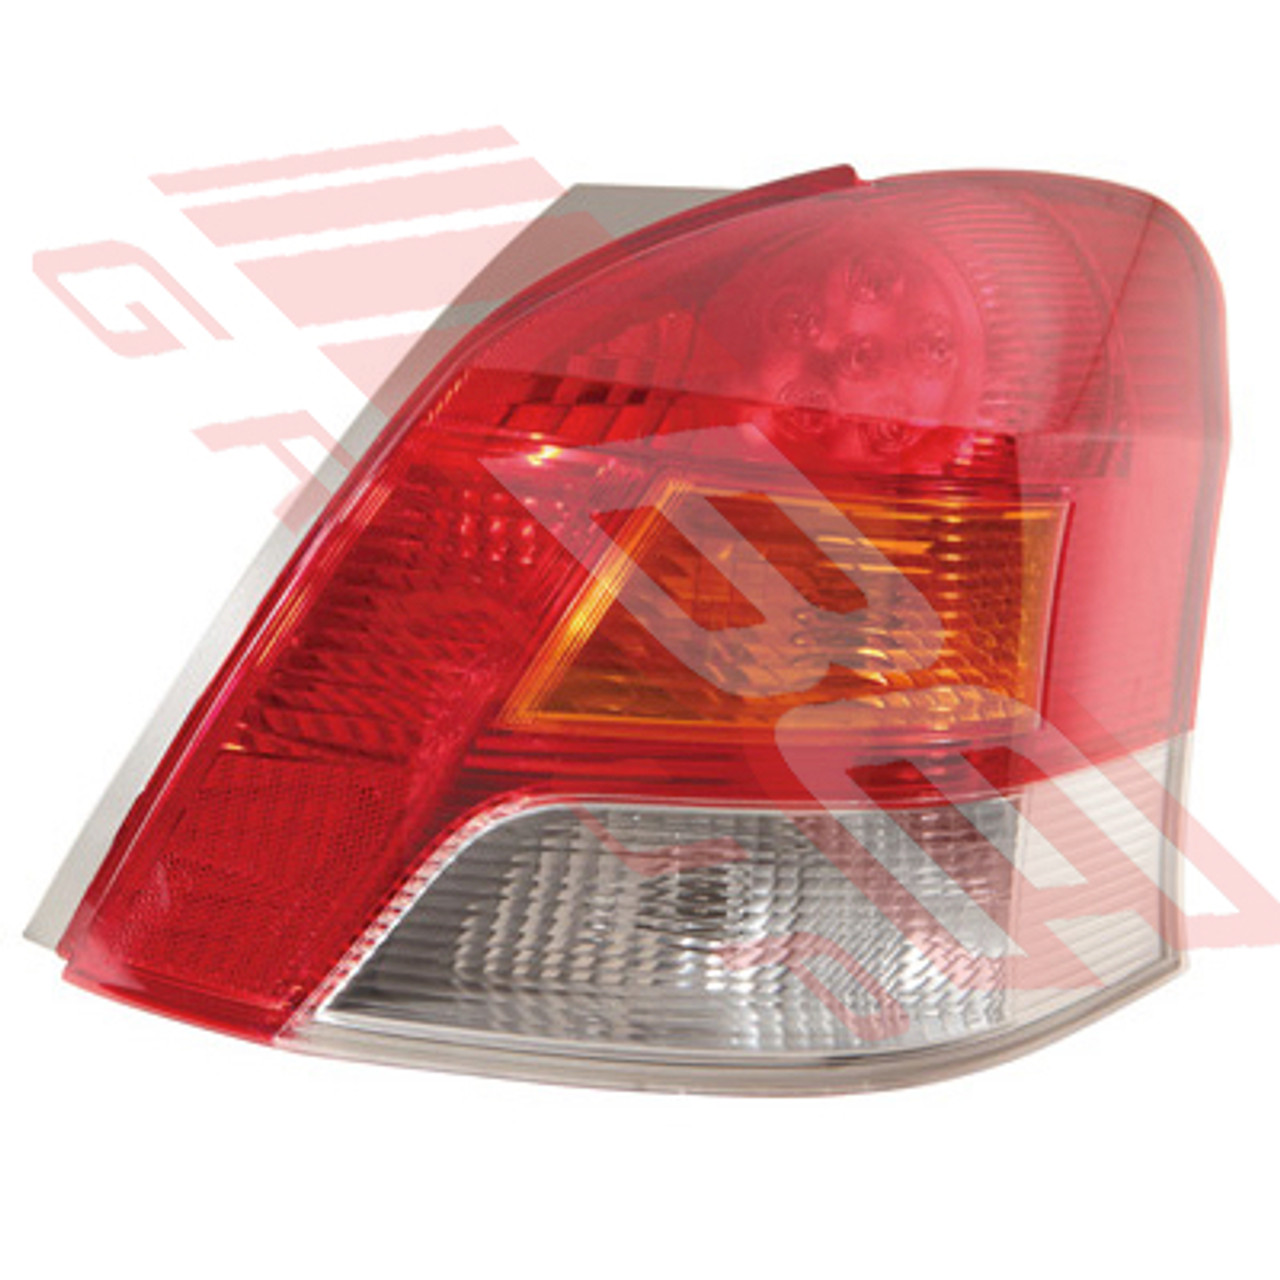 8116298-14 -REAR LAMP -R/H -TO SUIT TOYOTA YARIS/VITZ 2009- F/LIFT